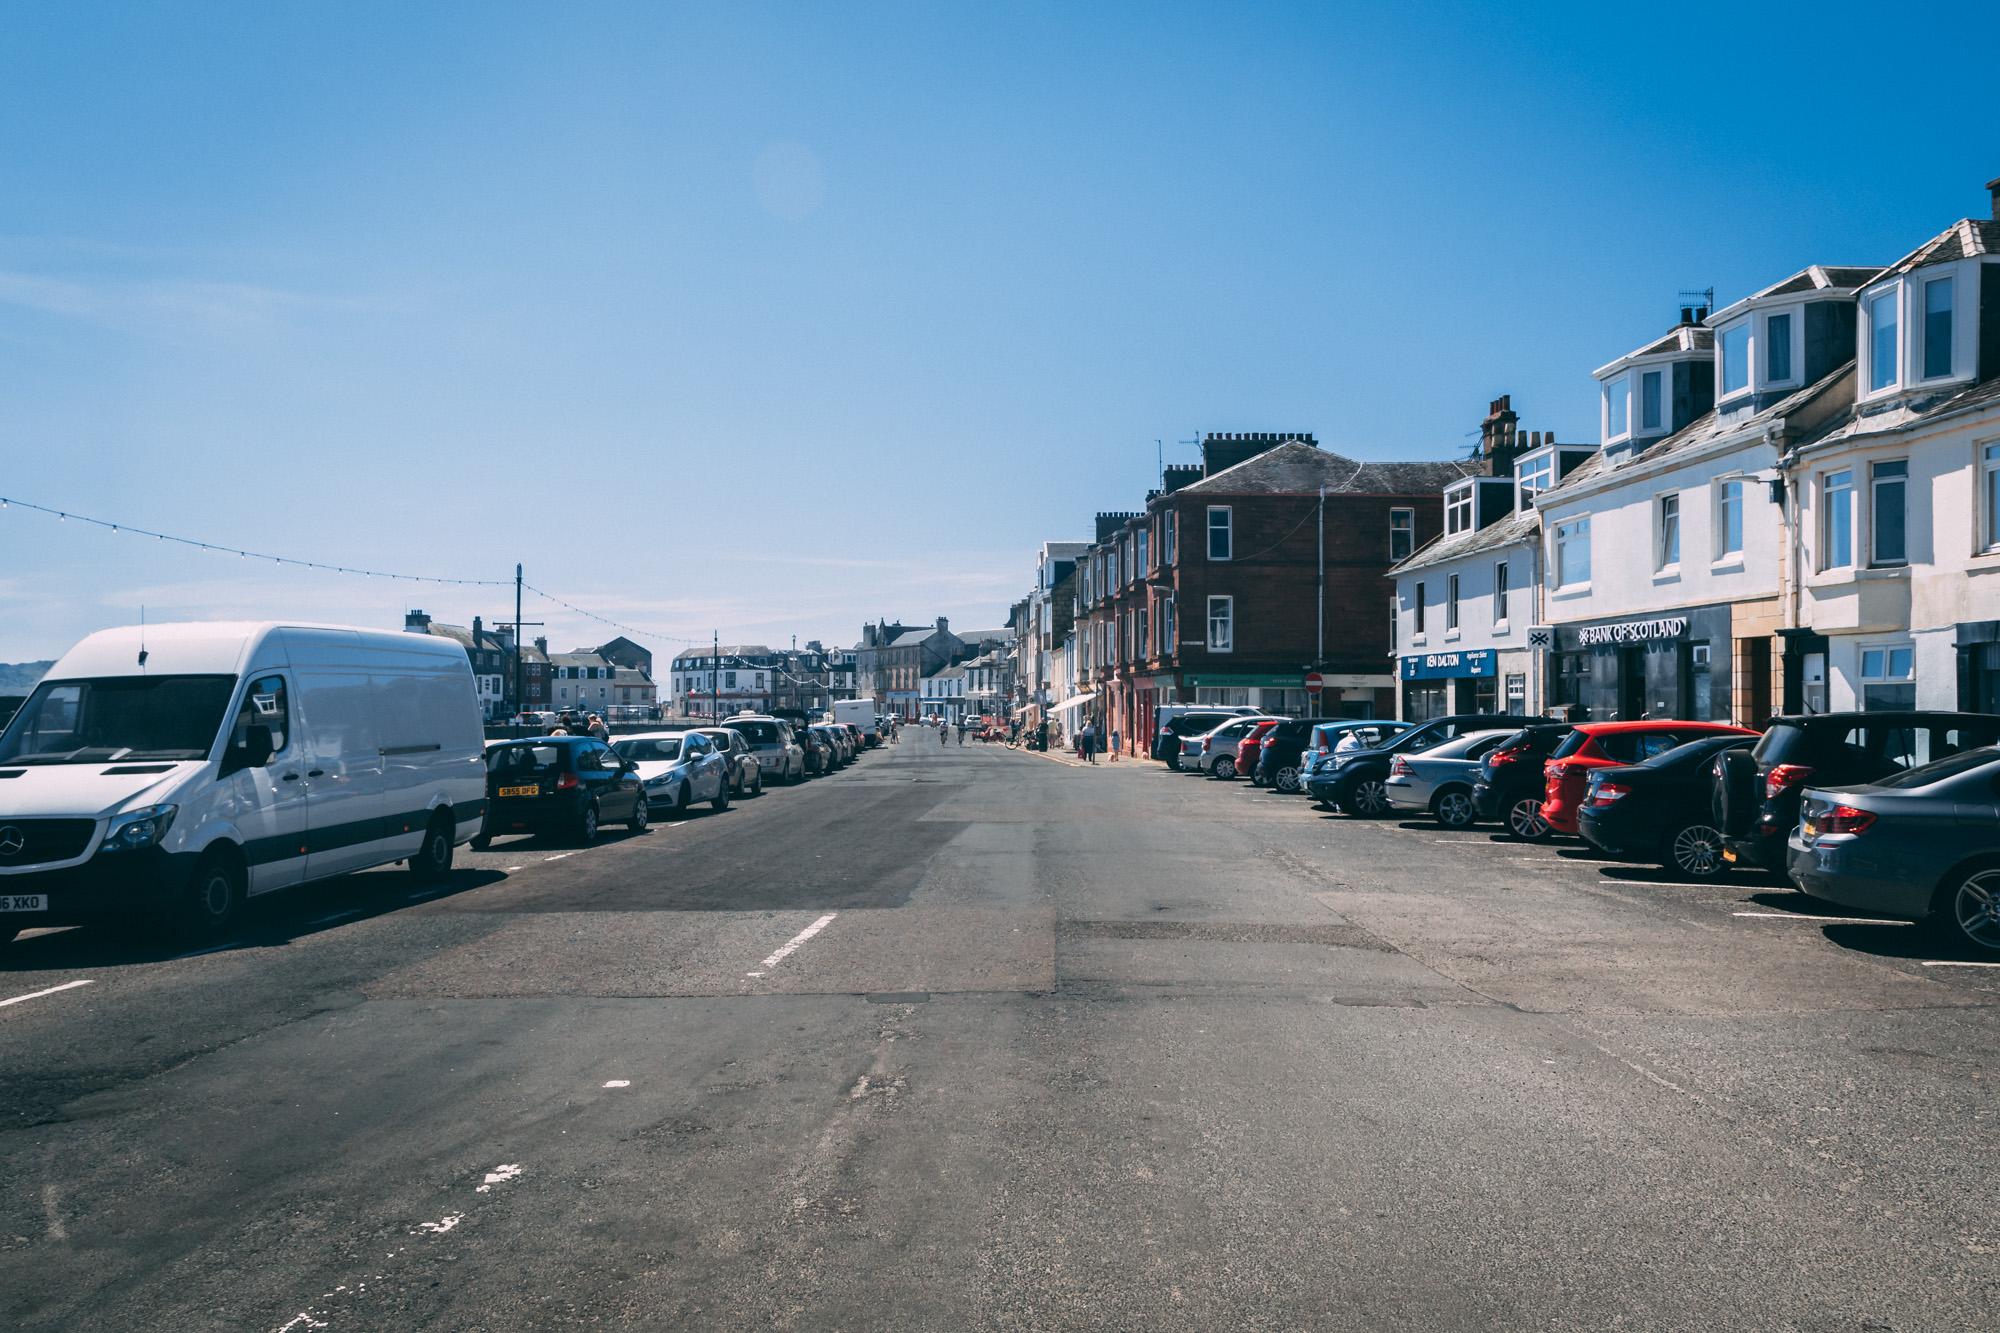 Millport Town